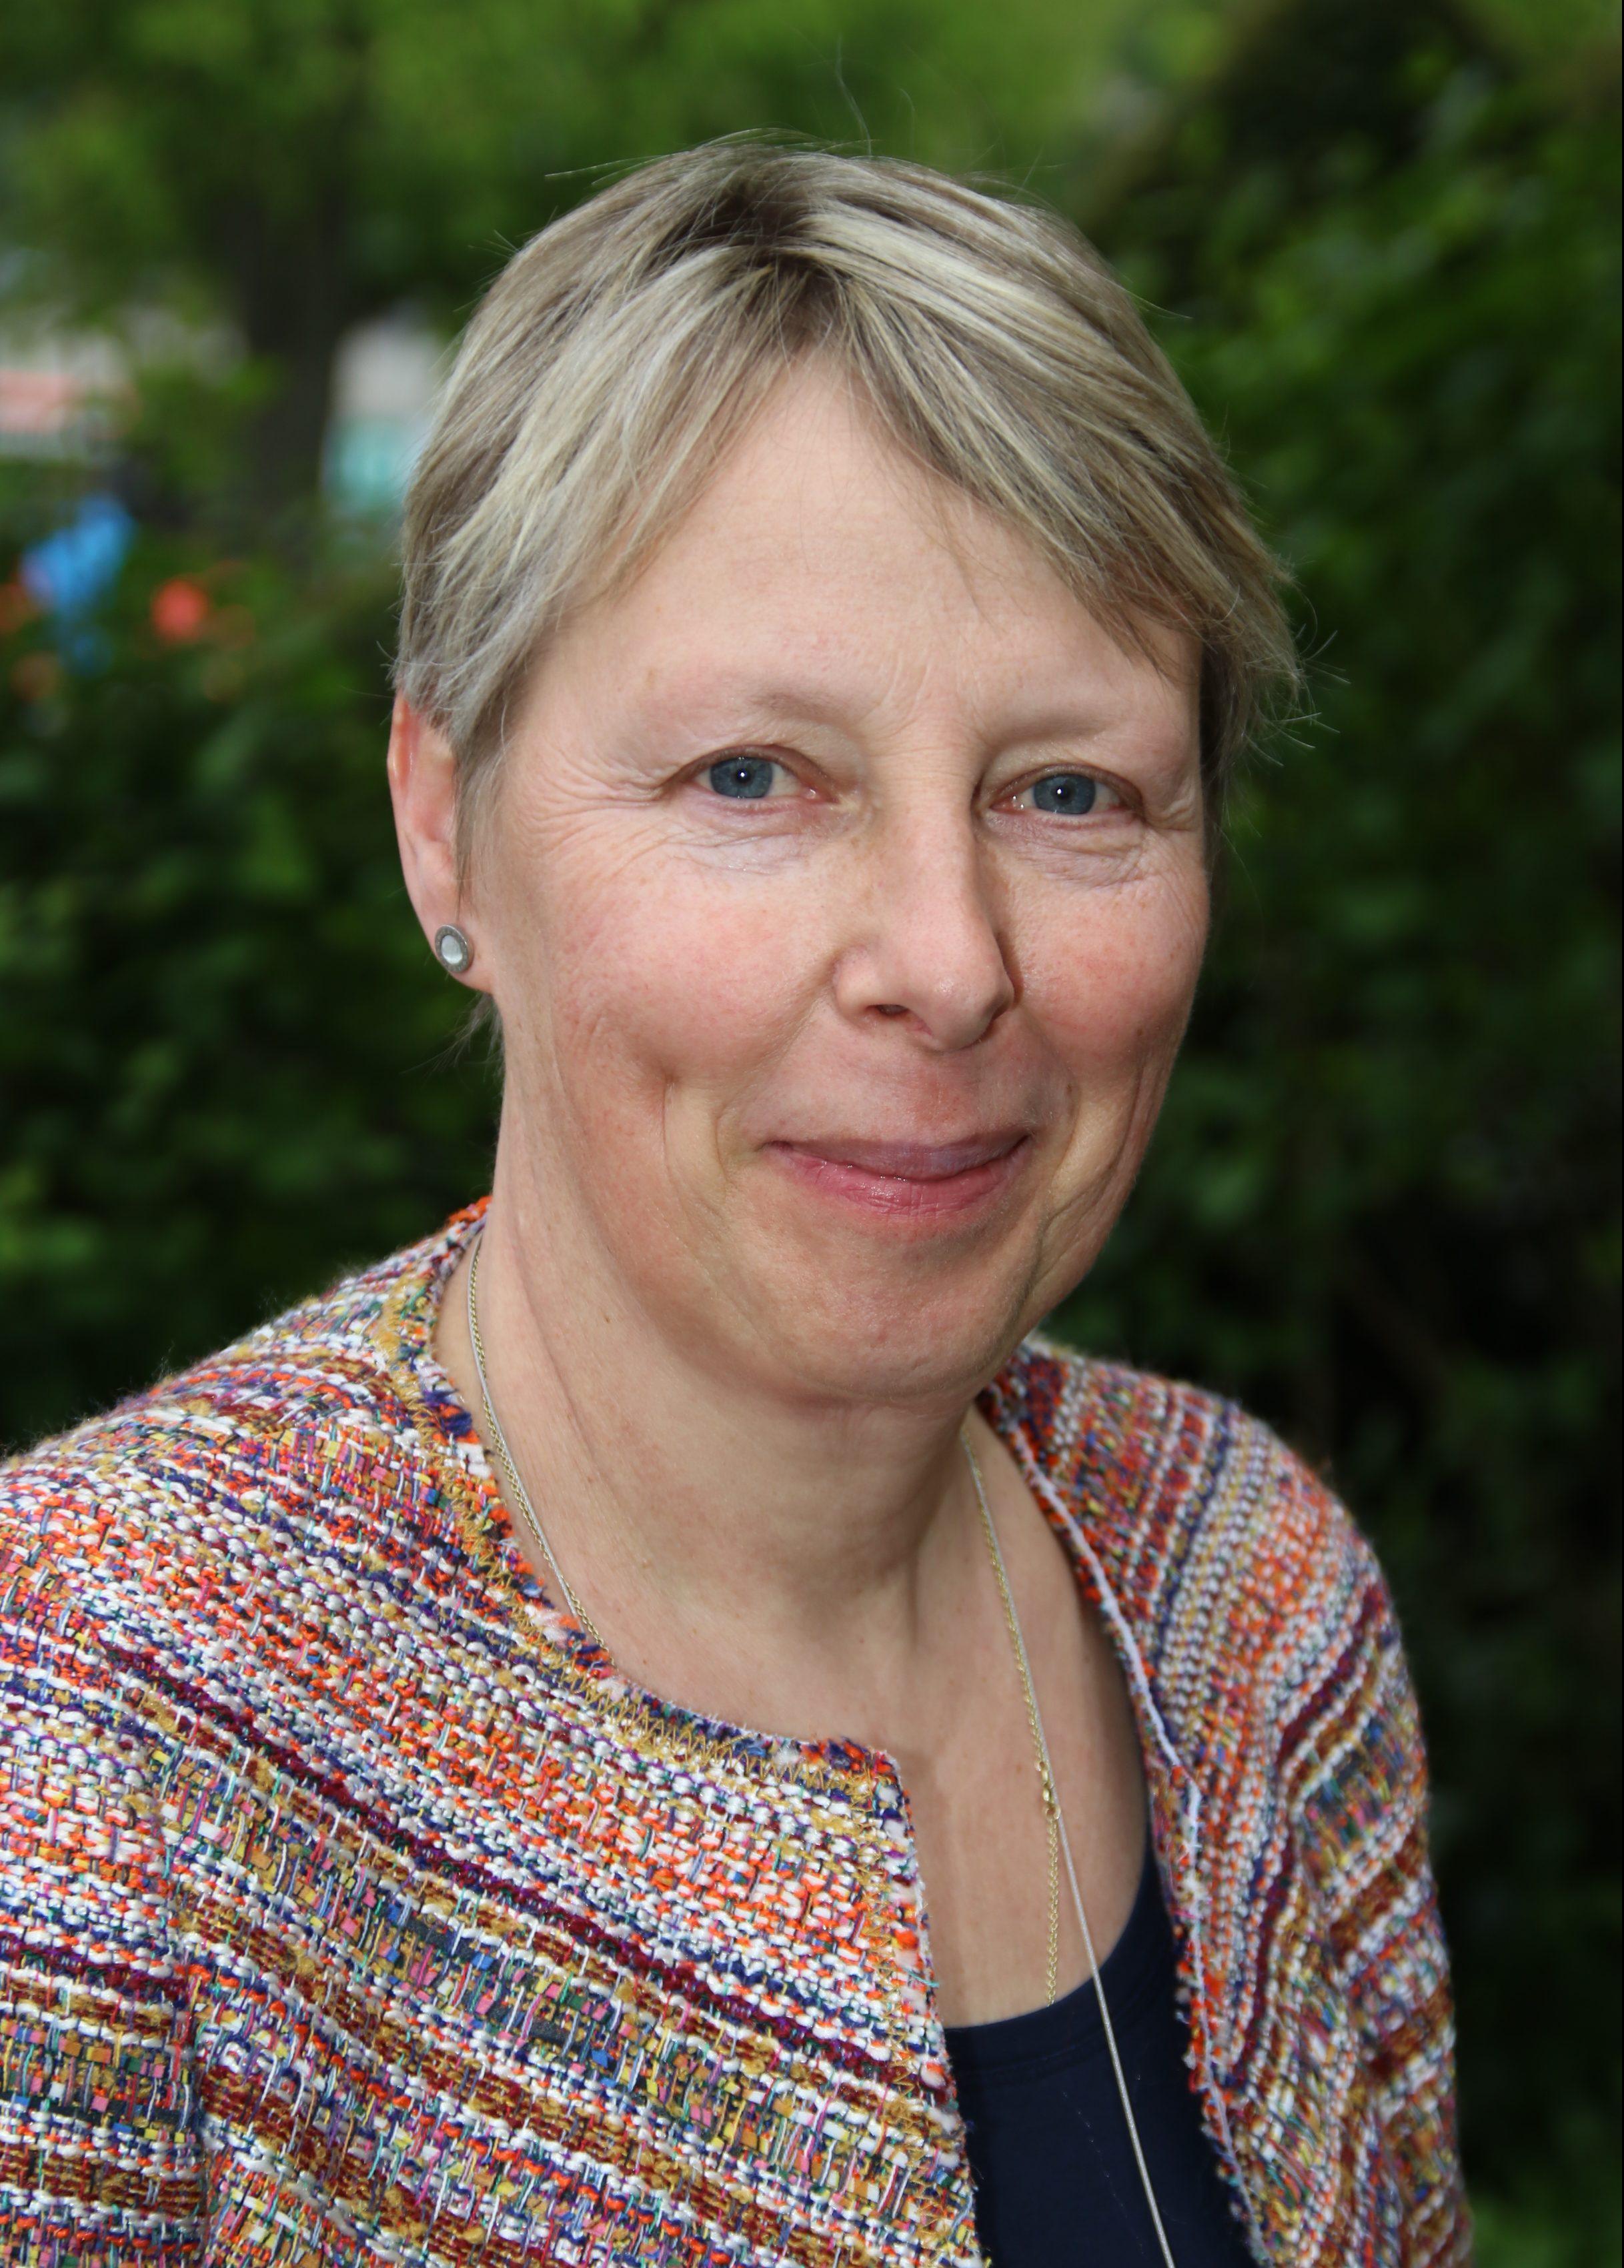 Martina Fahlenbock